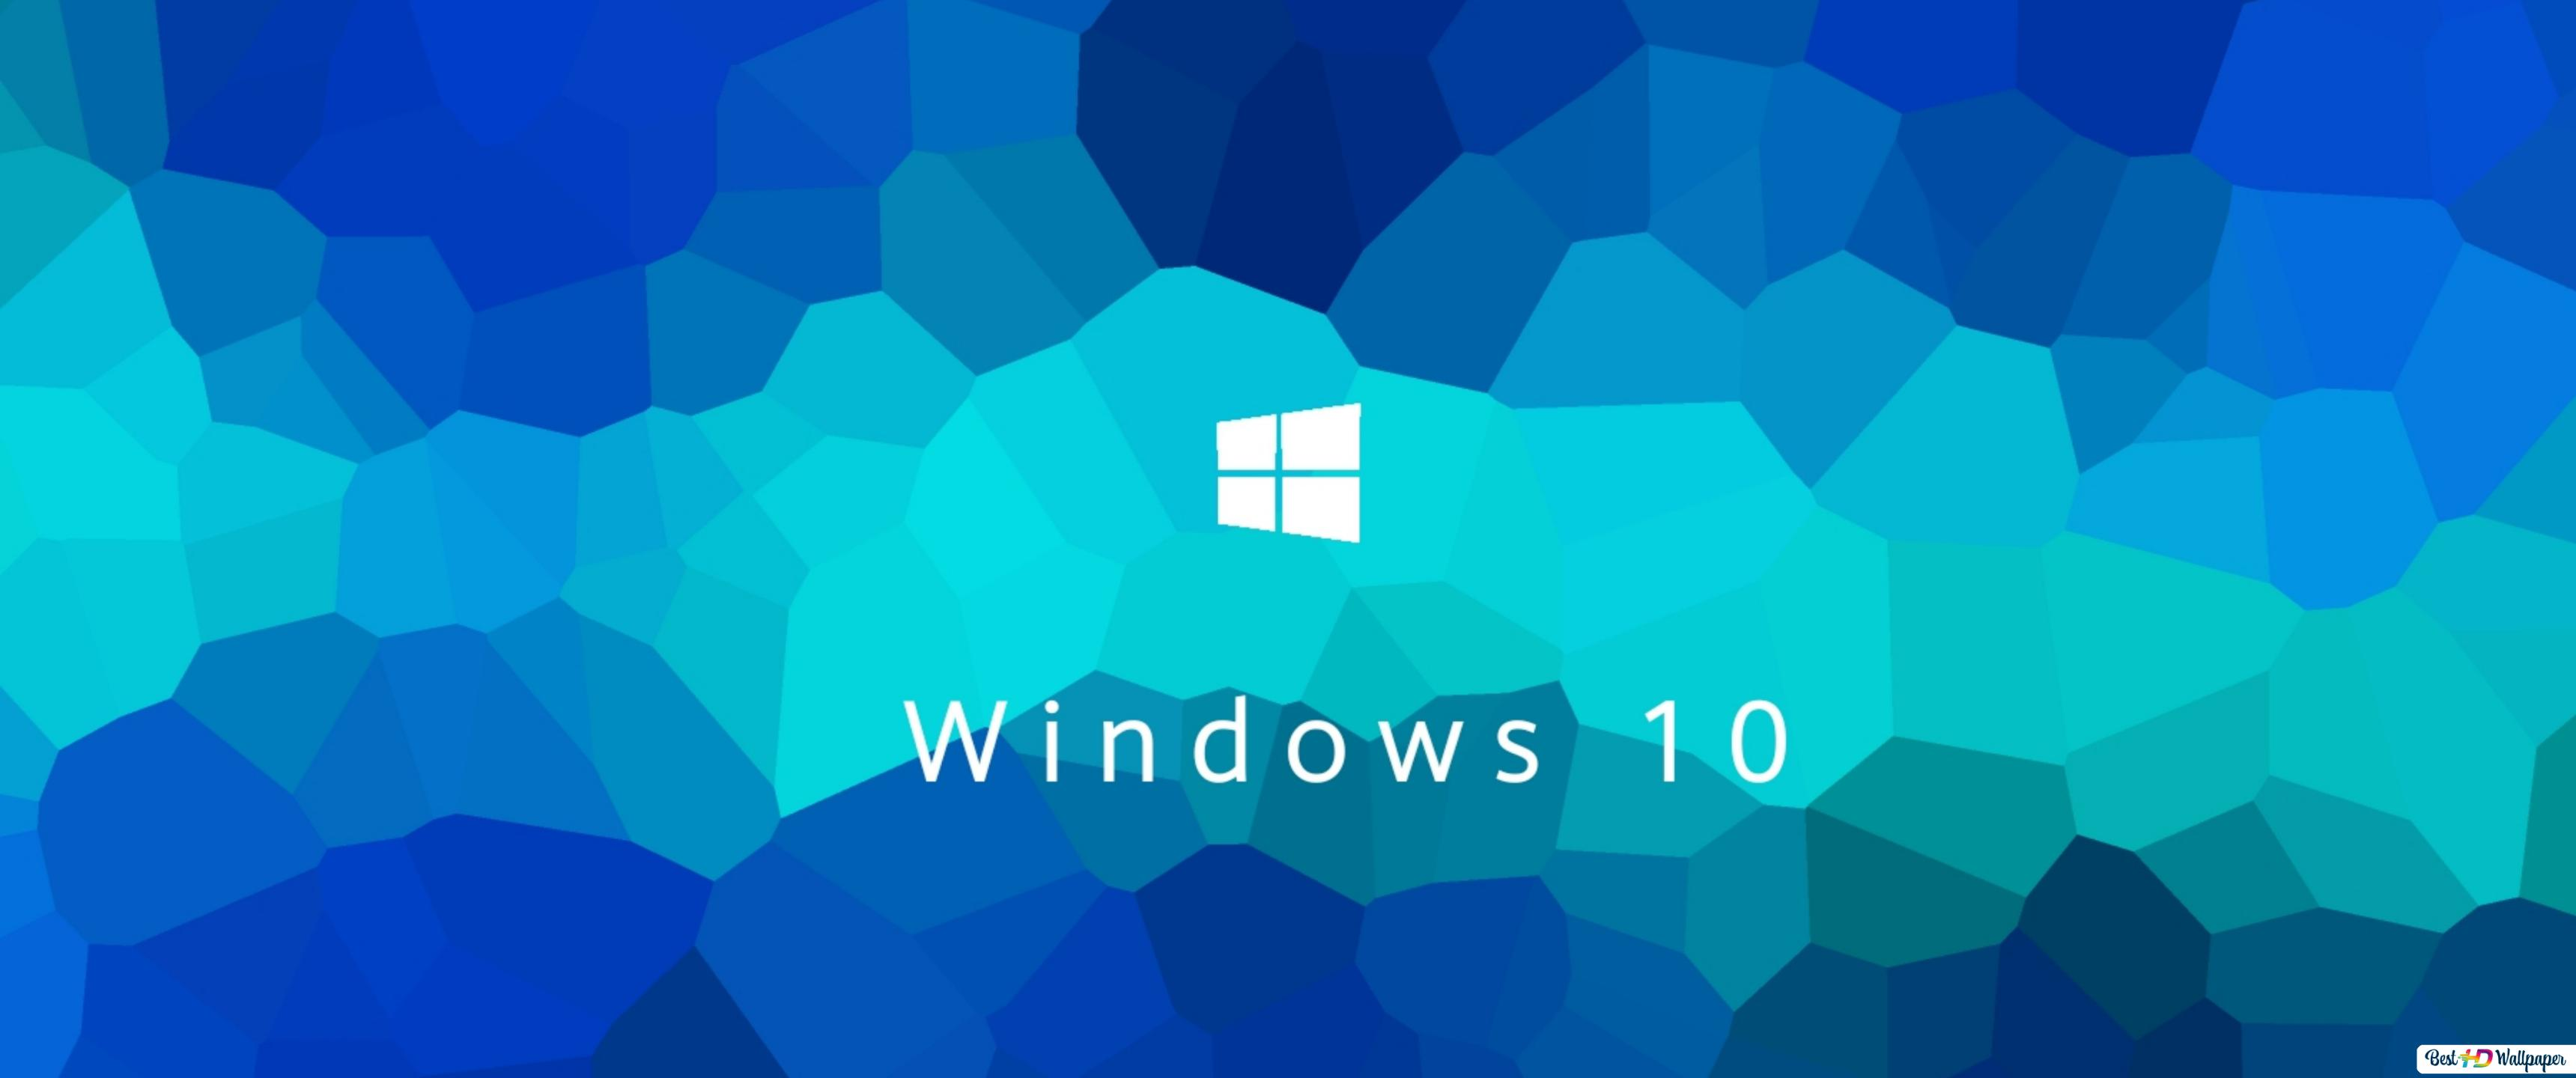 Windows 10 In New Blue Hd Wallpaper Download